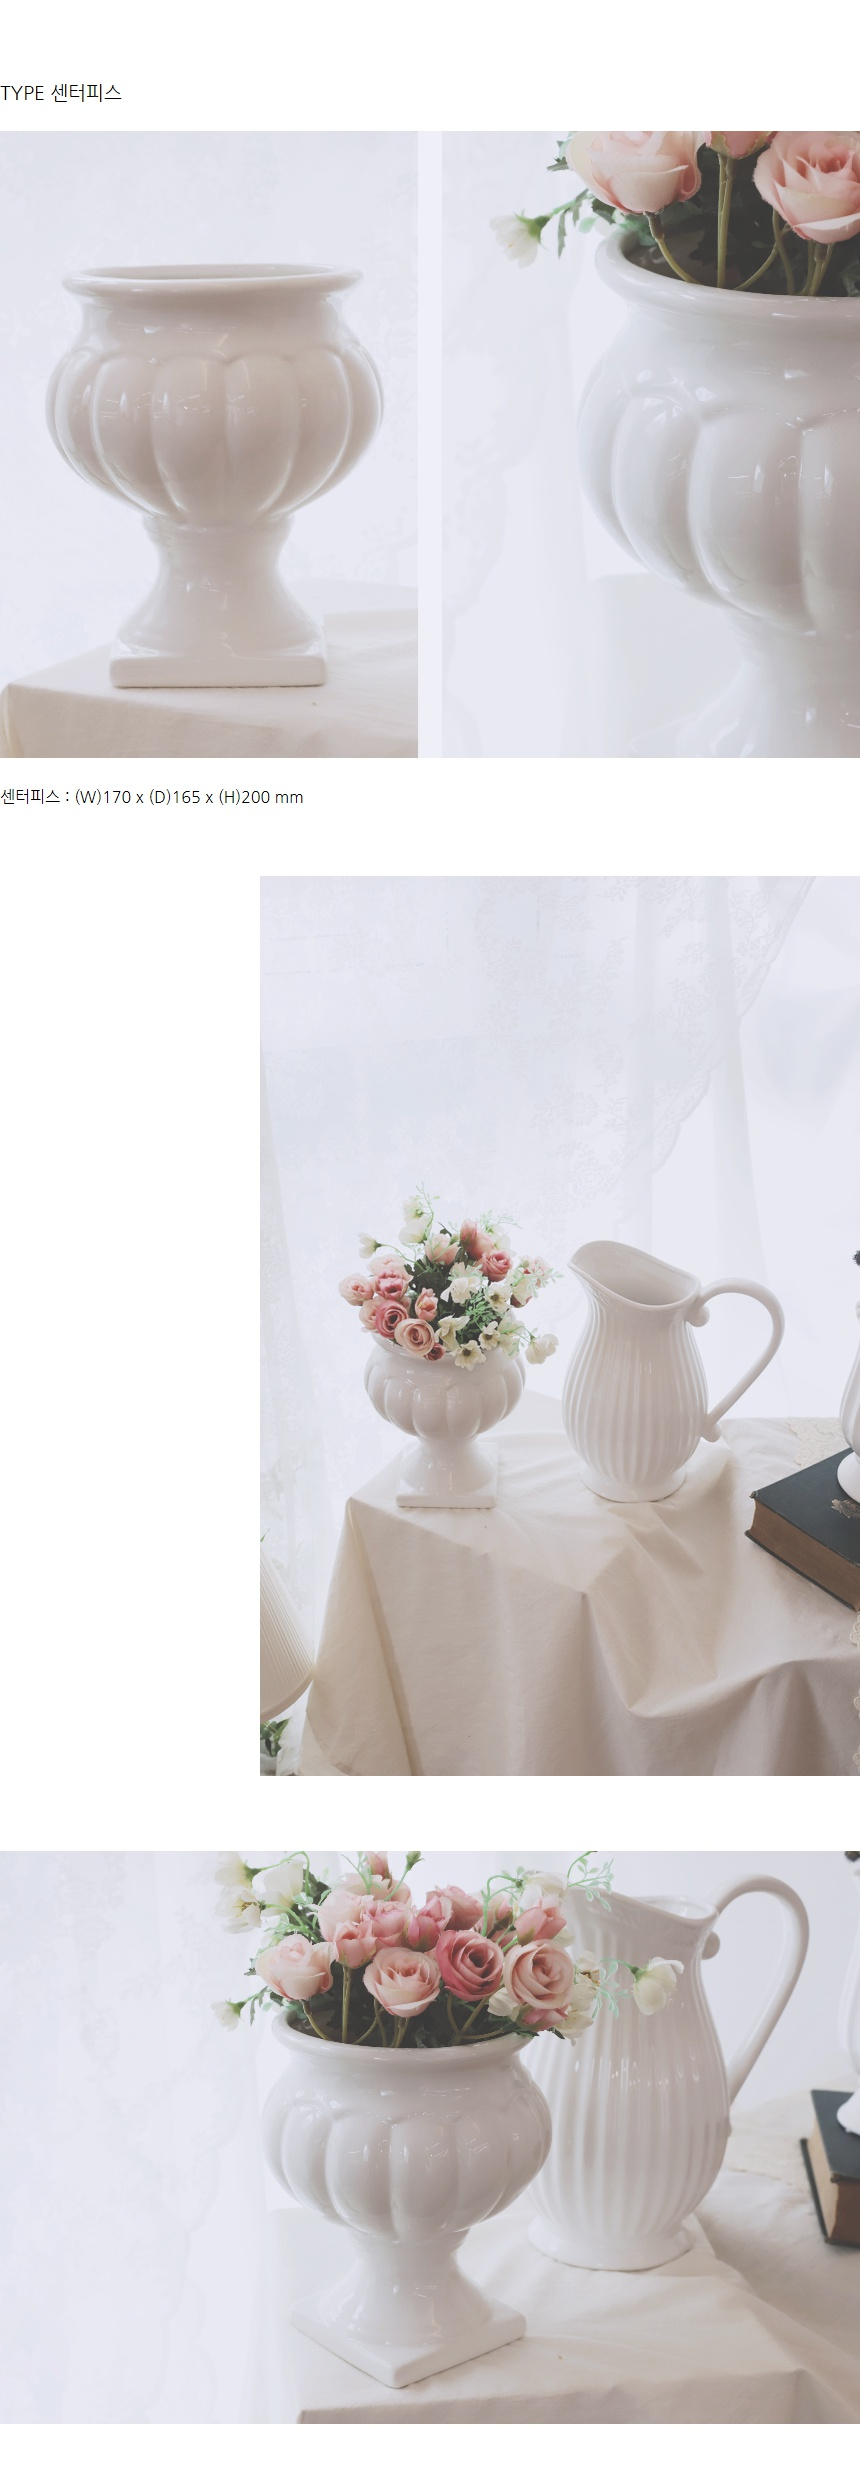 nordic_antique_pottery_vase_03.jpg